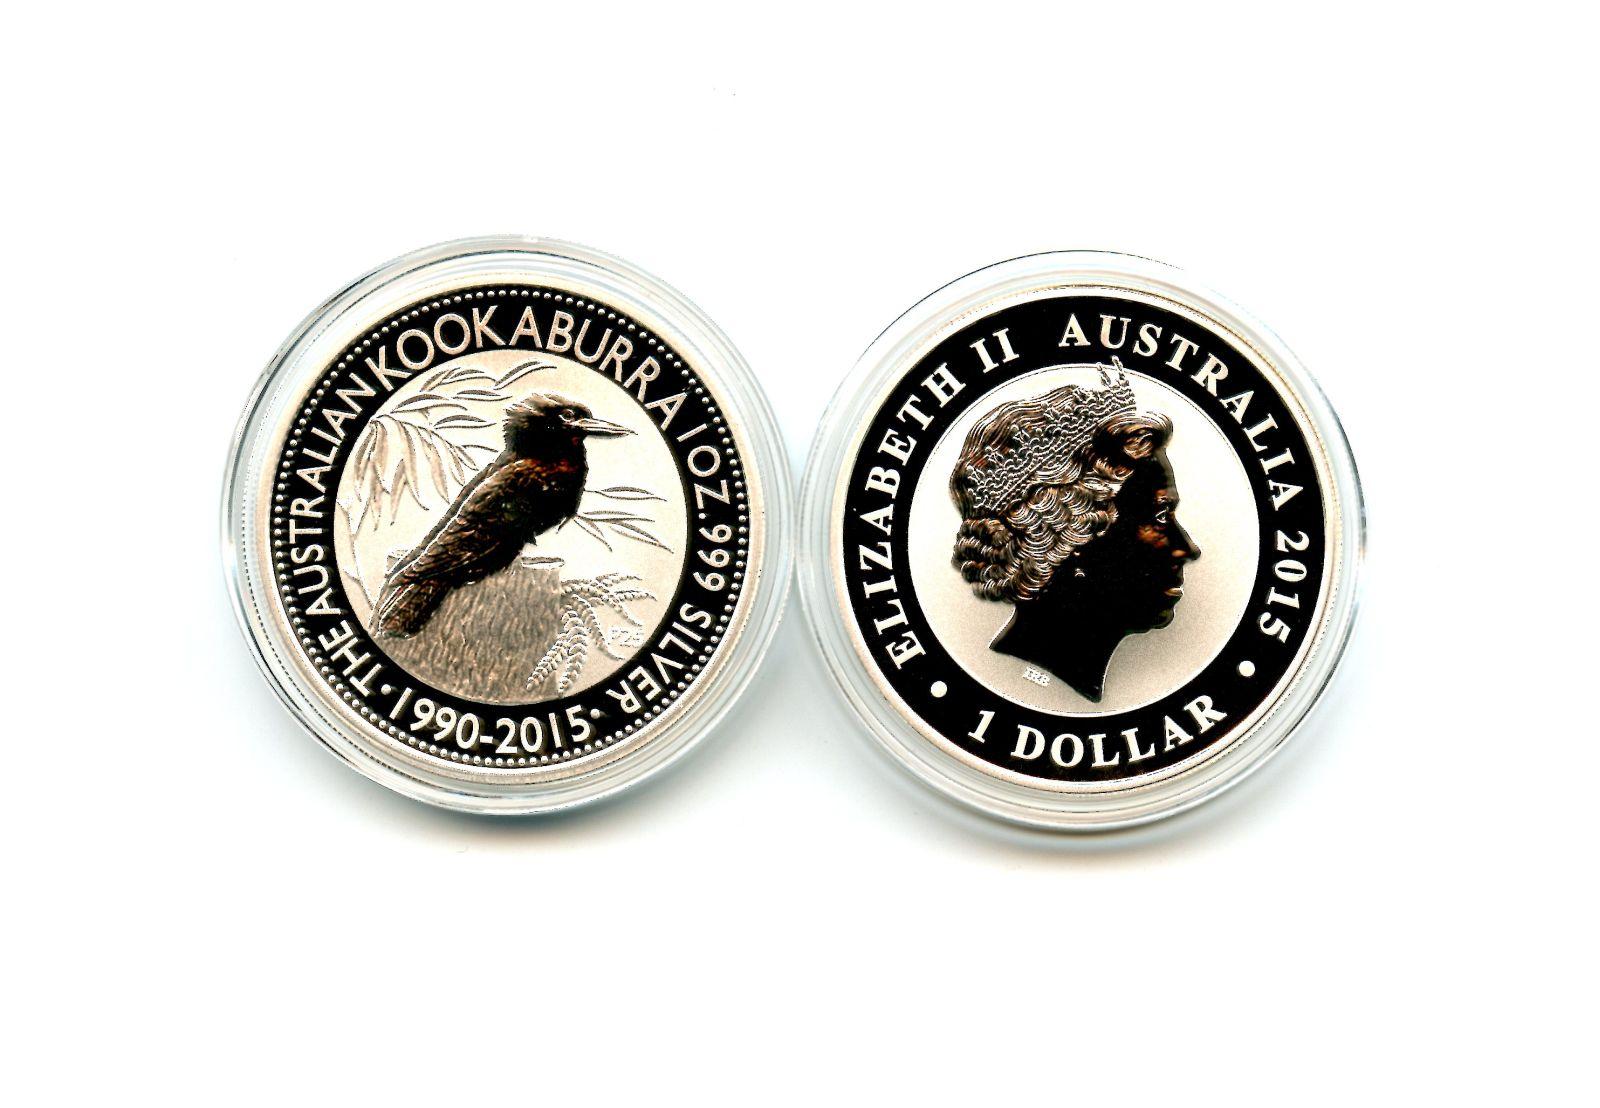 Australia & Oceania 2013 Australian Kookaburra 1oz 999 Silver Dollar Coin Coins & Paper Money